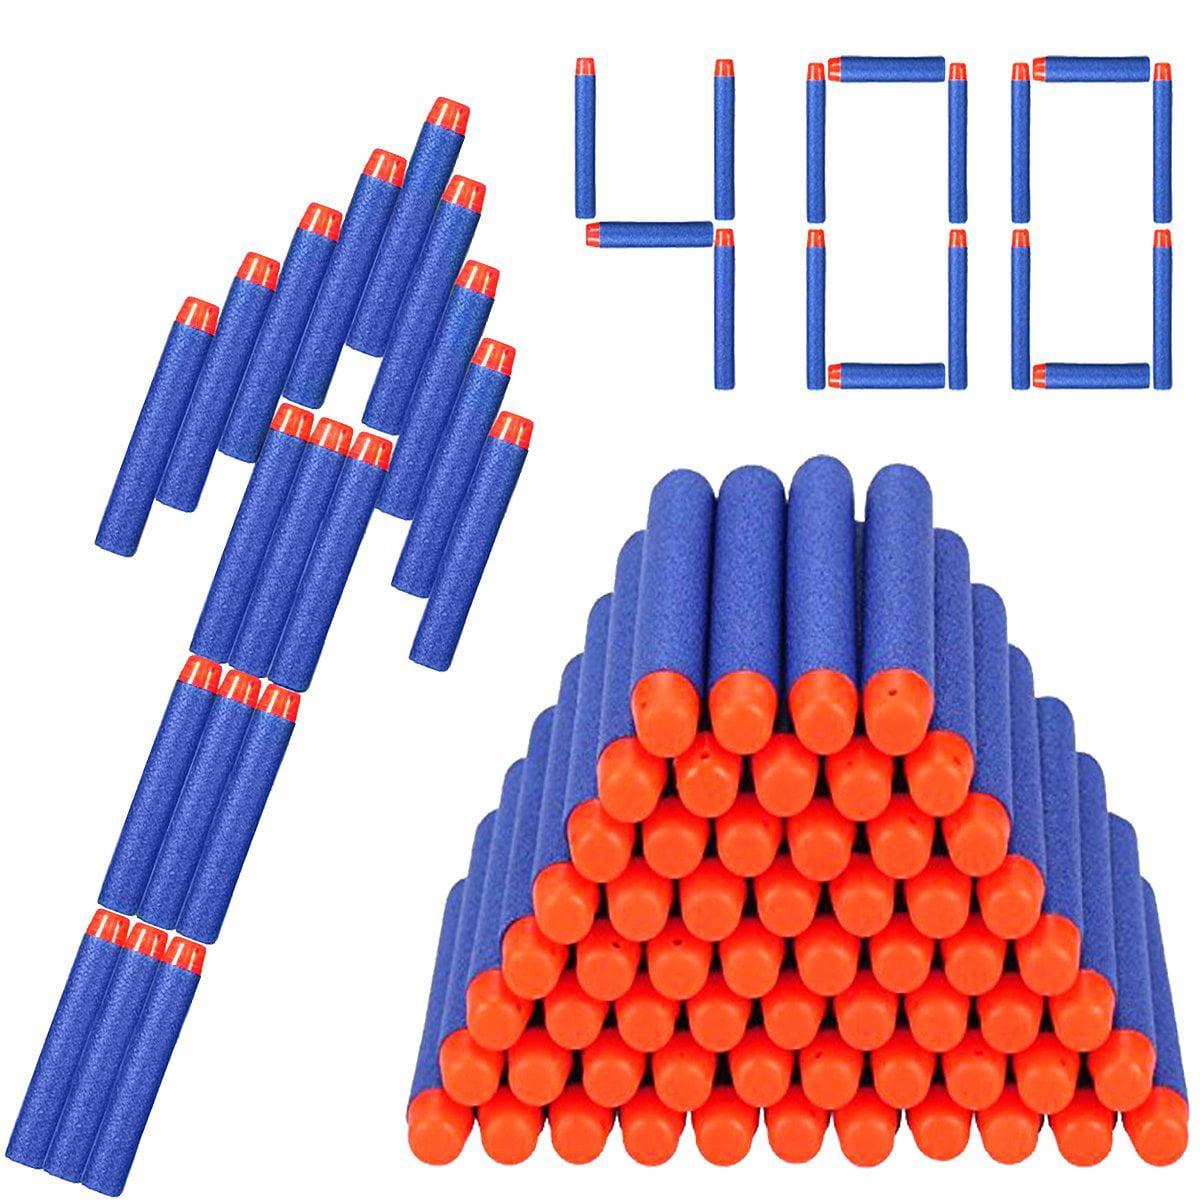 400pcs 7.2cm Soft Safety EVA Foam Refill Bullets Darts for Kids Toy Gun (Blue)